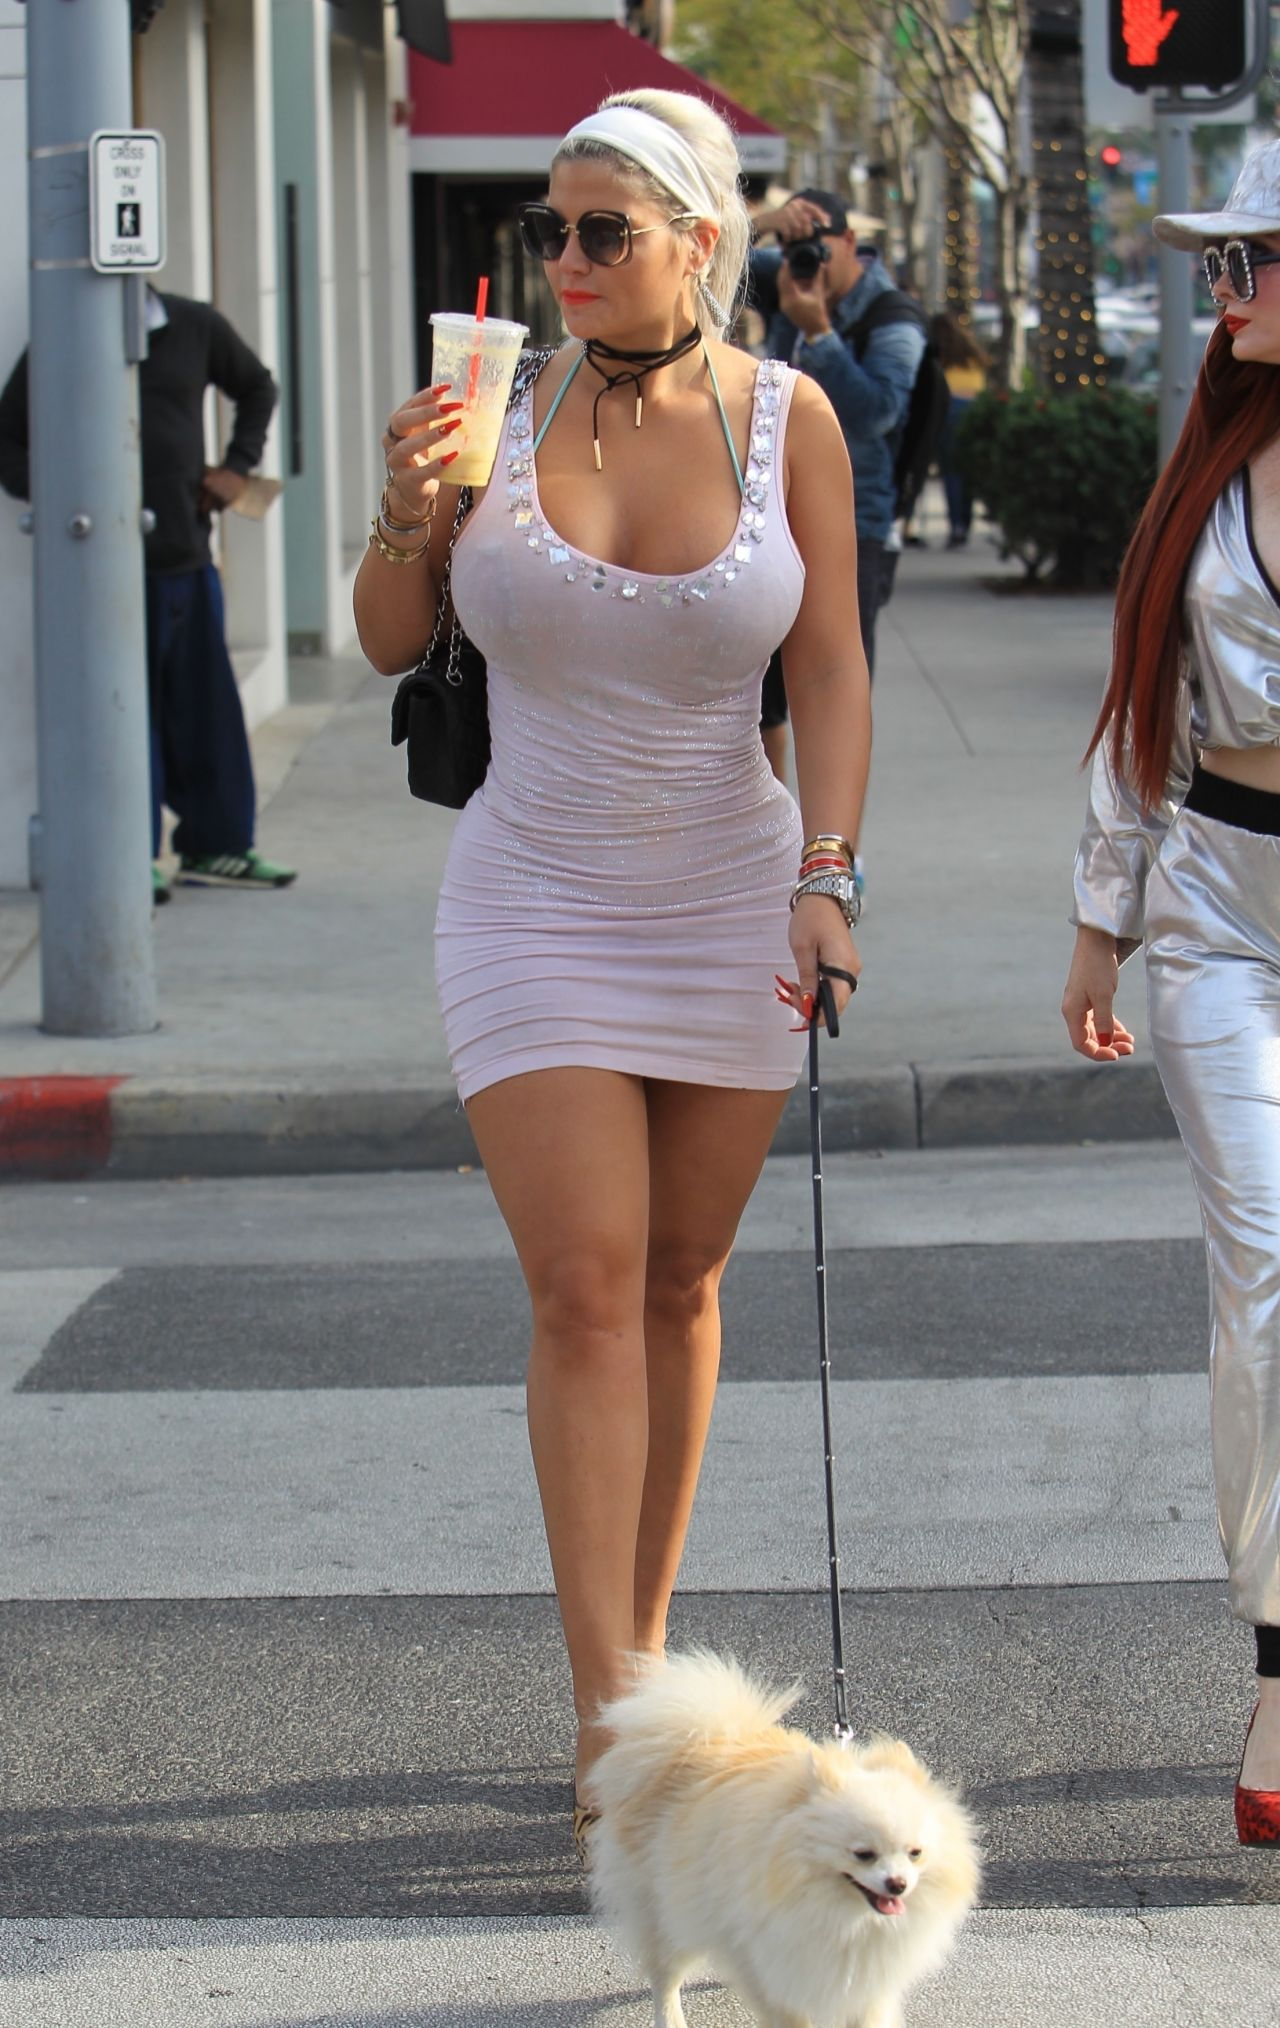 Sophia Vegas nudes (72 photos) Hot, 2020, butt